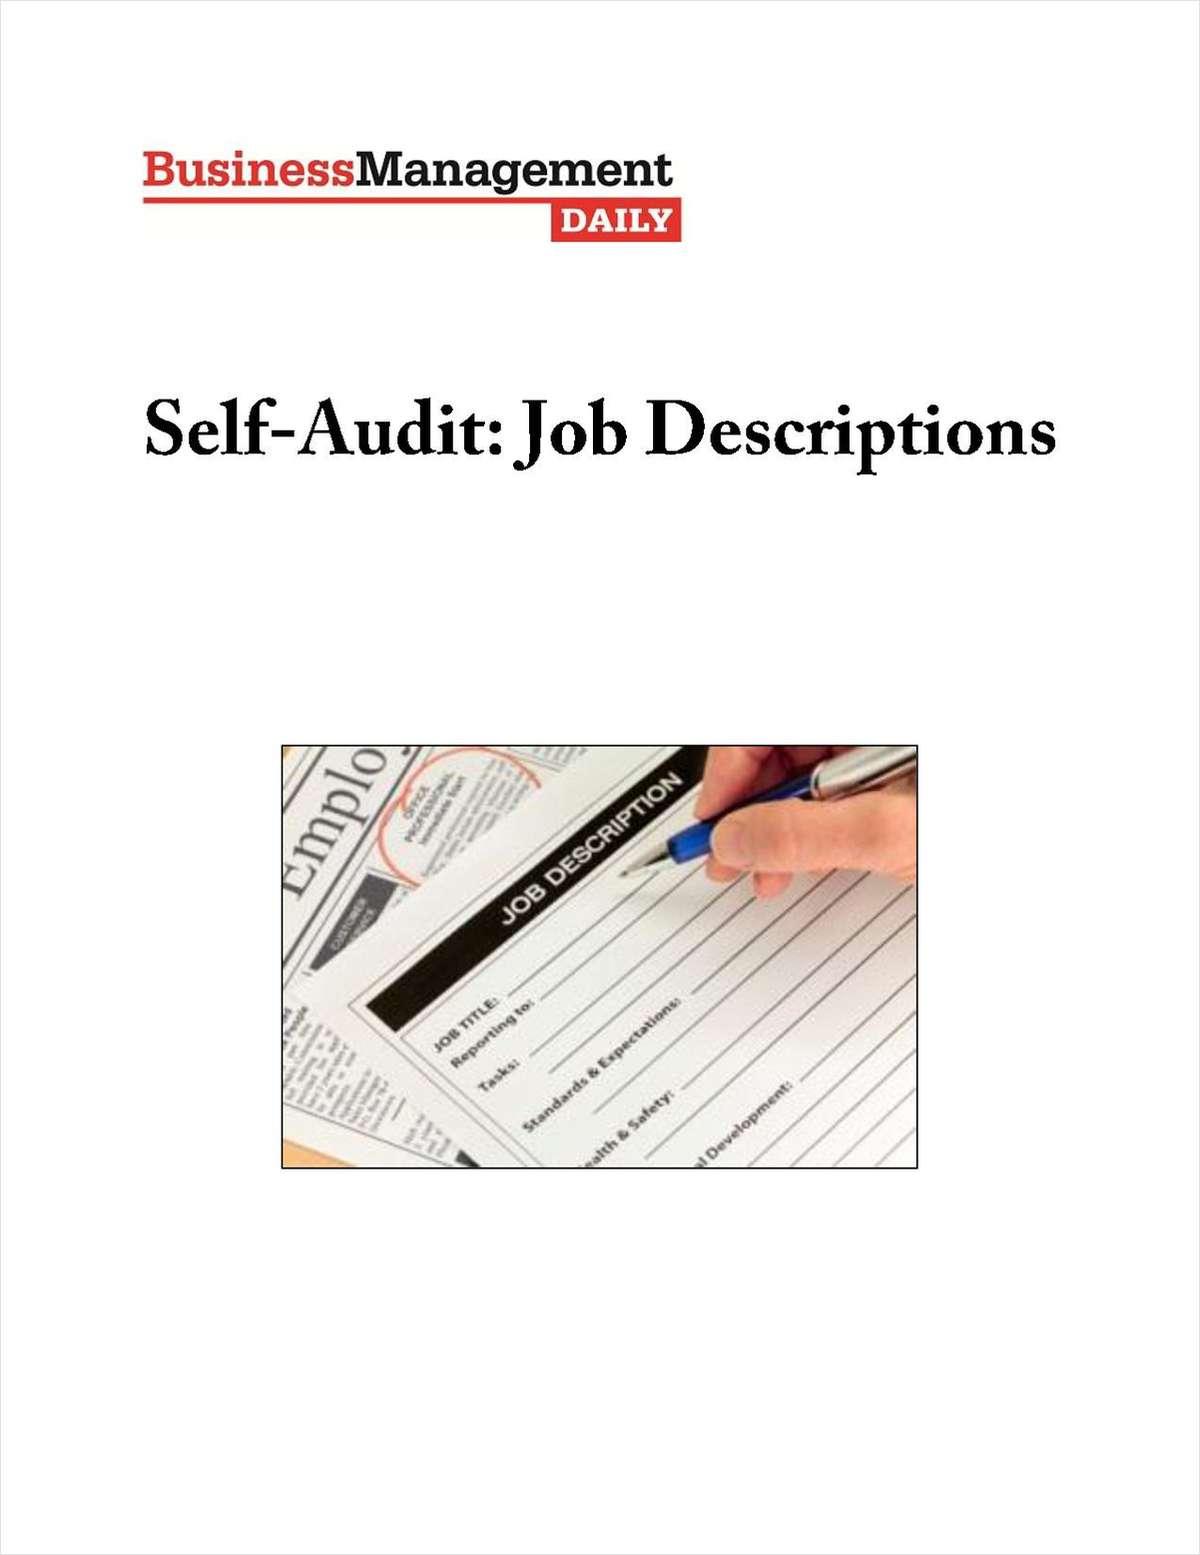 description of self for job